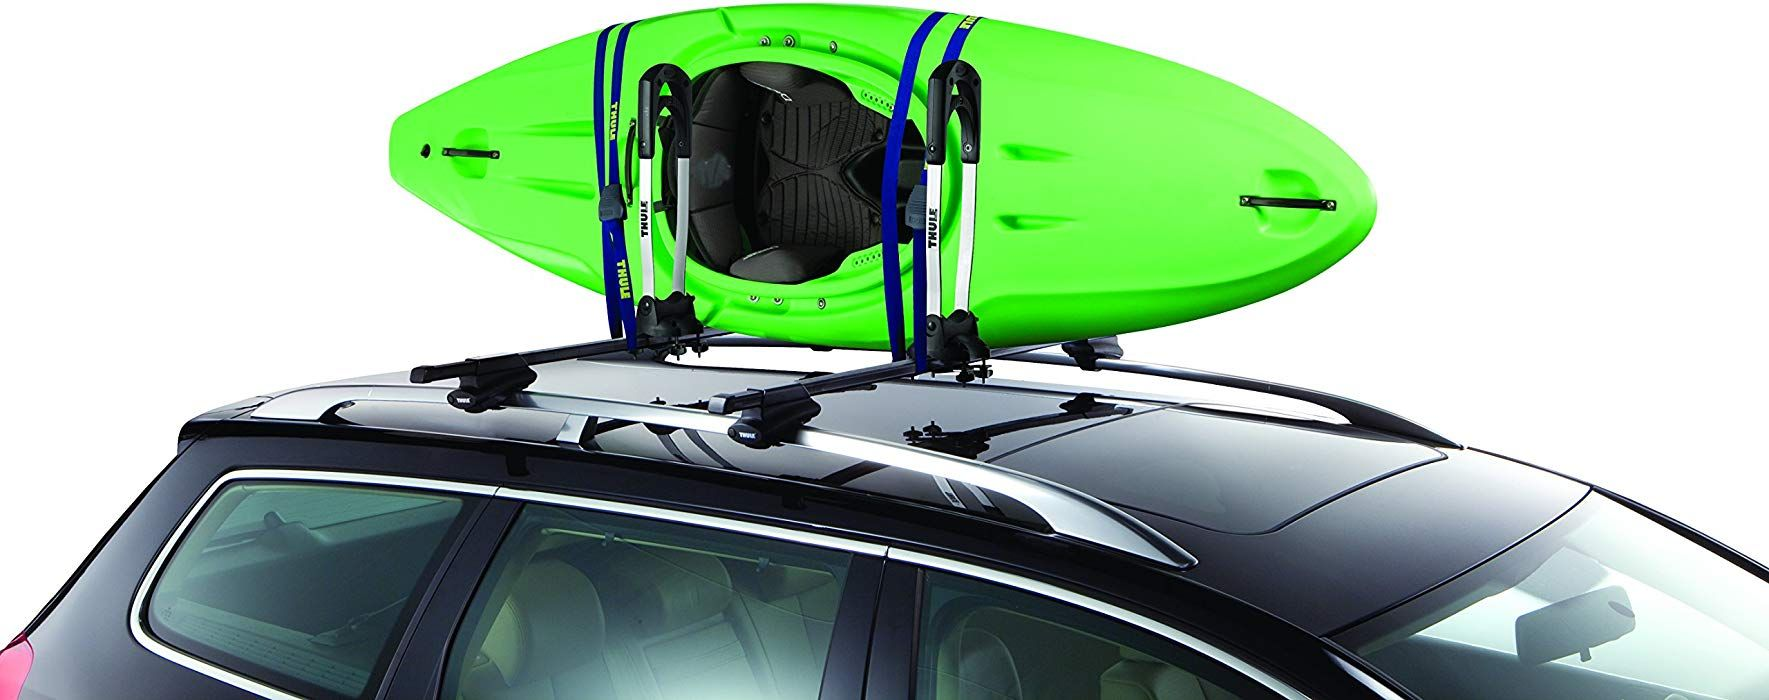 Thule 854 Water Slide Kayak Carrier Accessory Mat By Thule 35 95 Amazon Com The Thule 854 Water Slide K Kayaking Water Slides Kayak Storage